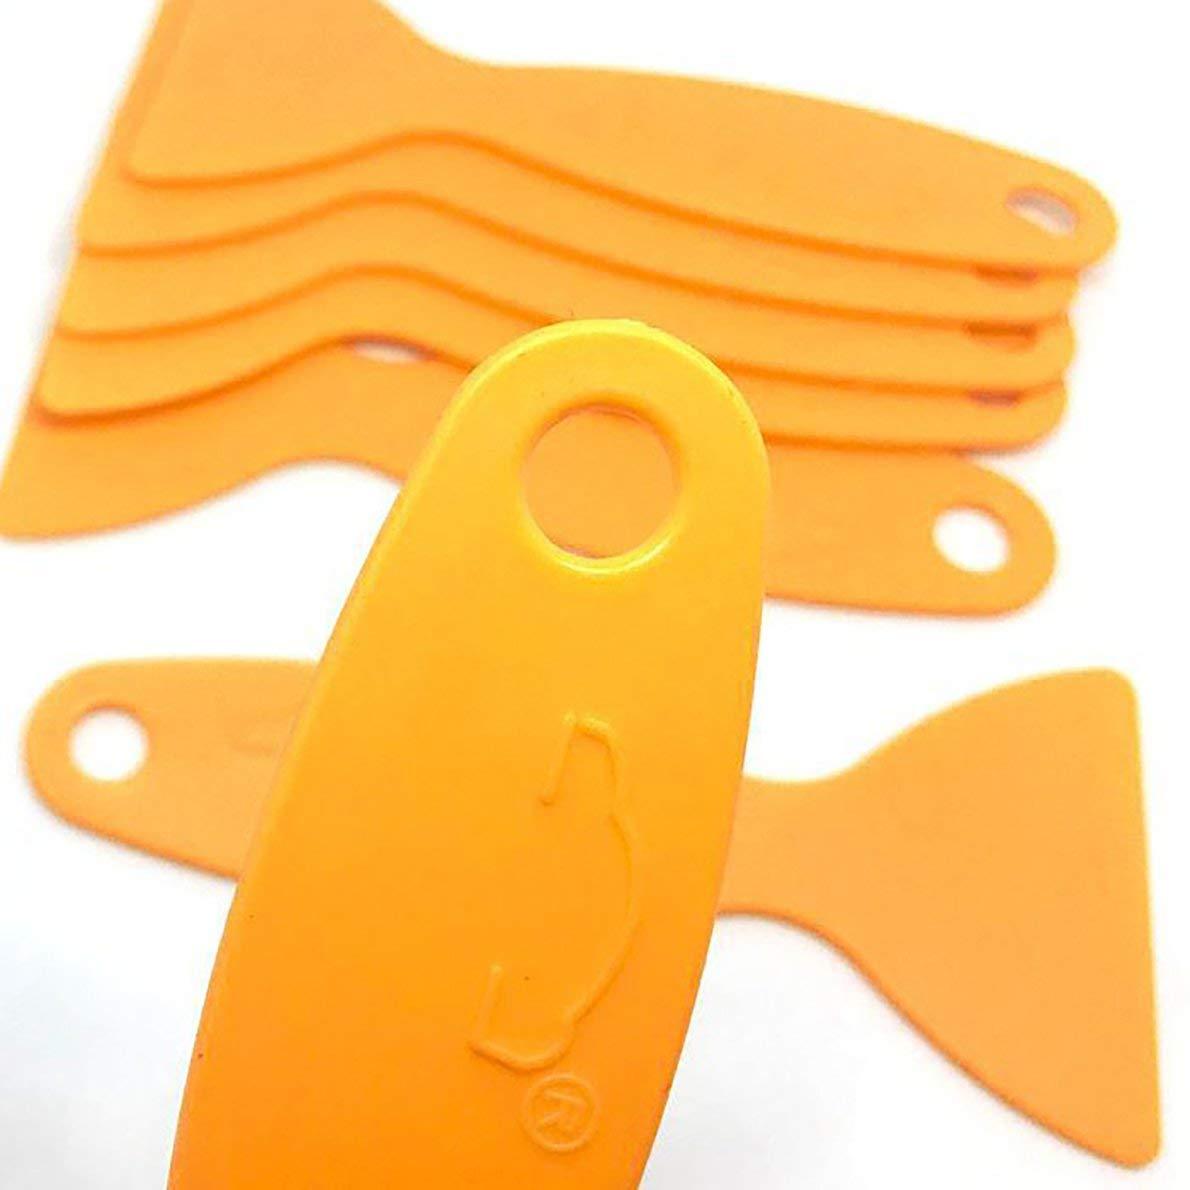 Uqiangbao Scraper Plate Glass Yellow Film Tools Wrapping Film Application Squeegee Scraper Tools Plastic Bubble Window Car Stickers Car Electronics & Accessories Car Electronics Accessories